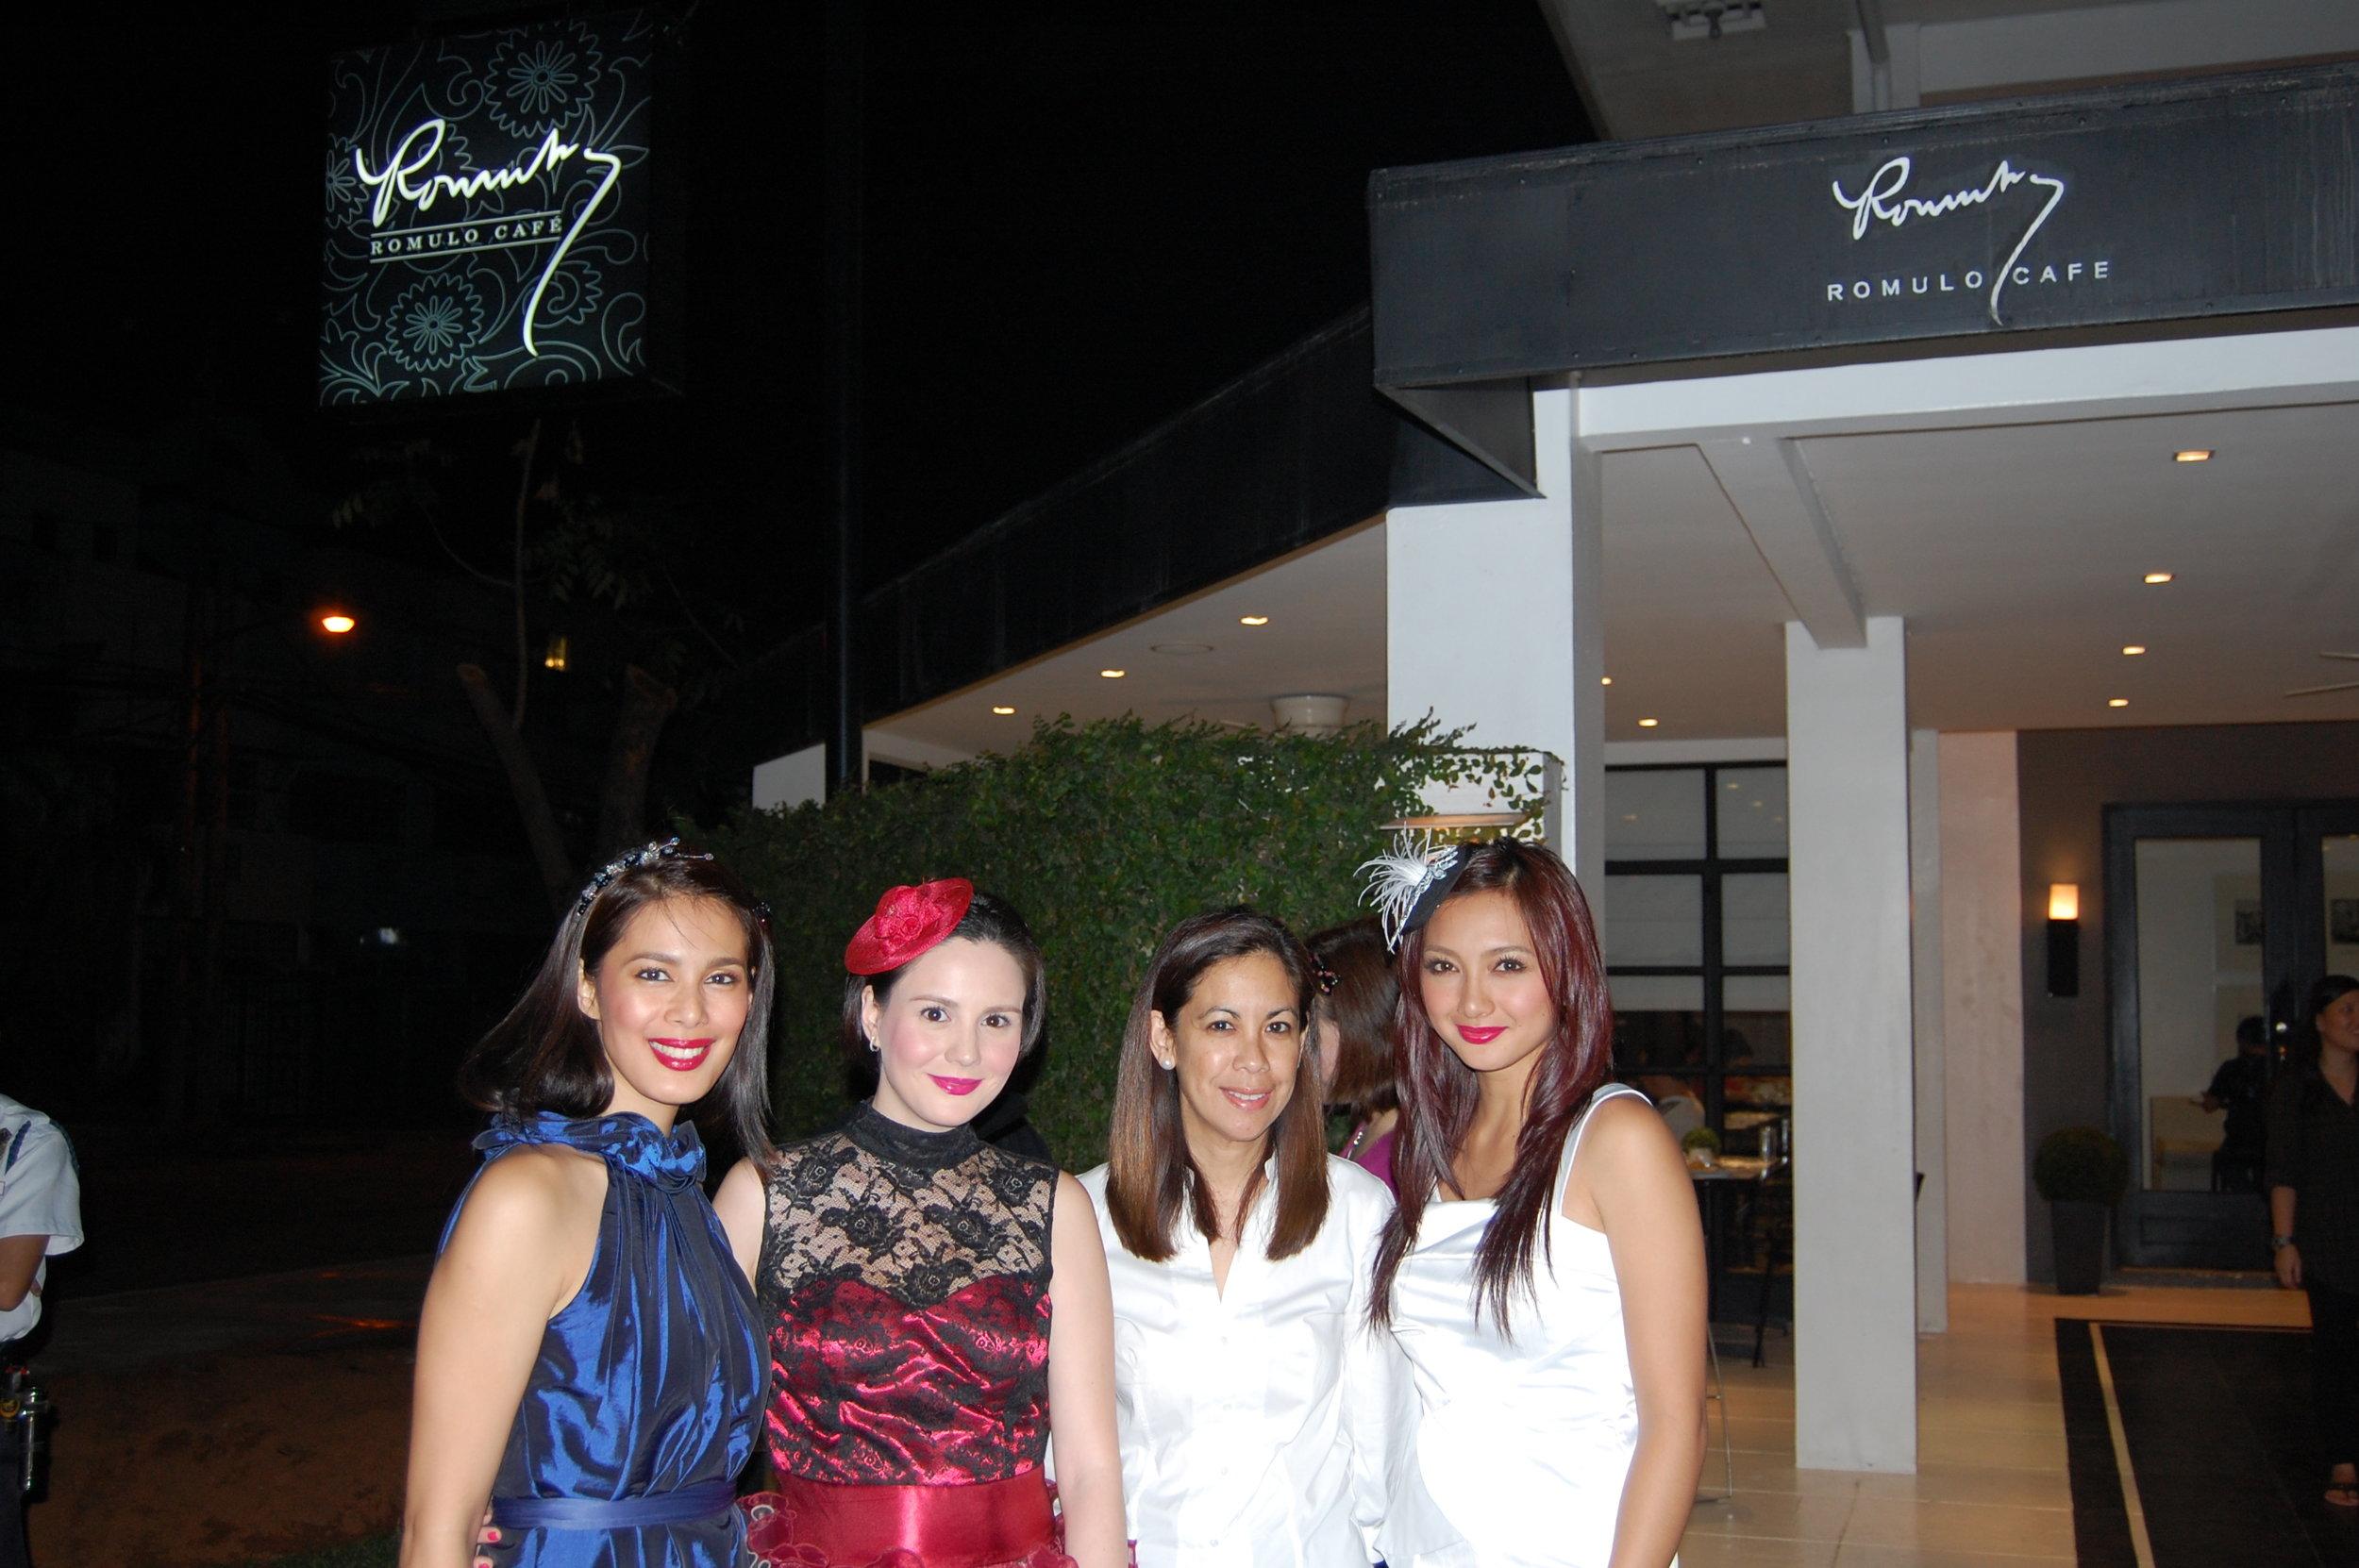 With Angel Aquino, Cheska Garcia, and Iya Villania